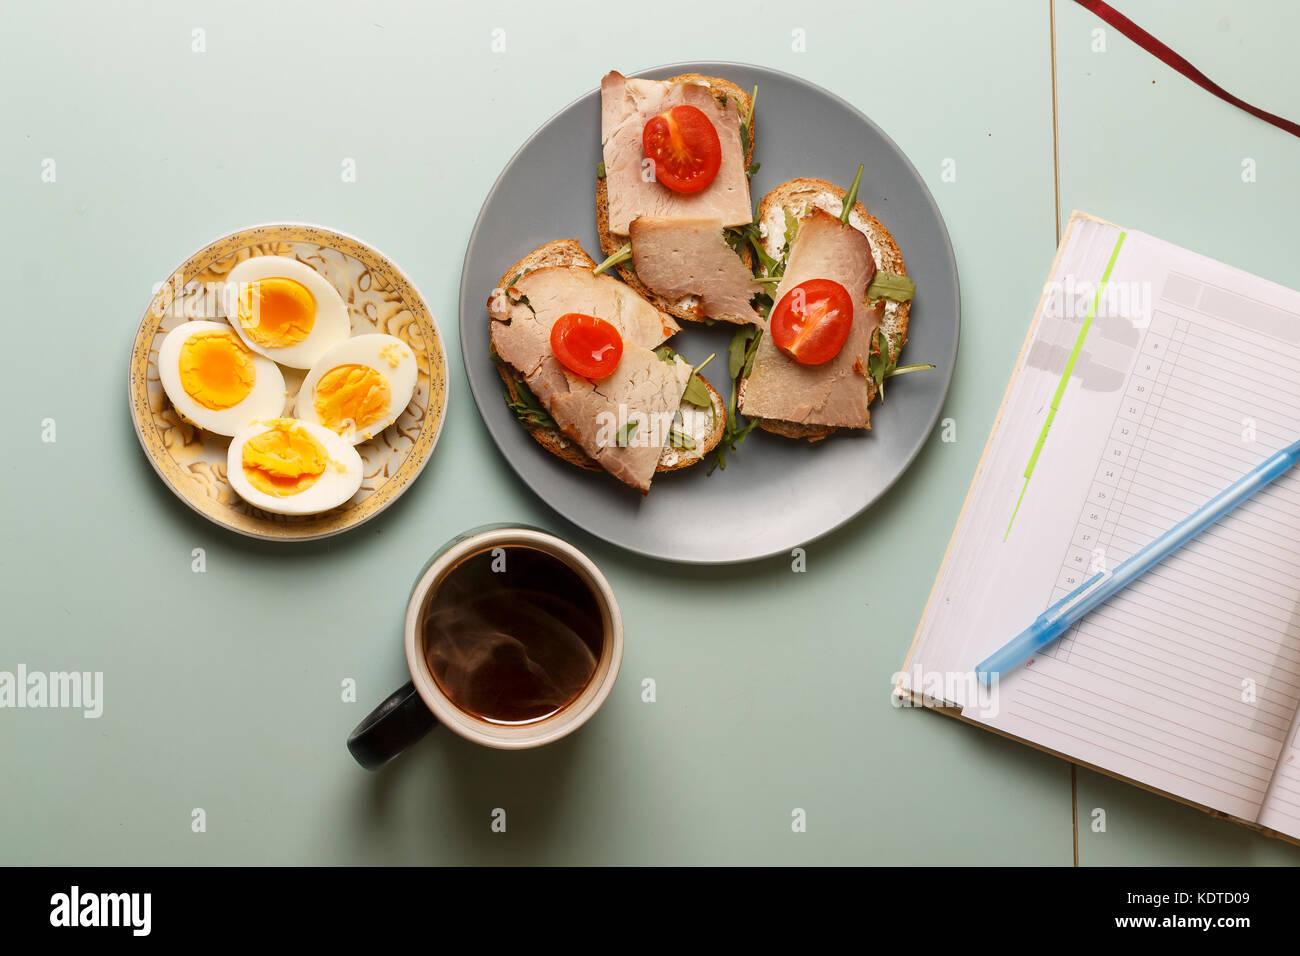 recipe: ham for breakfast healthy [39]